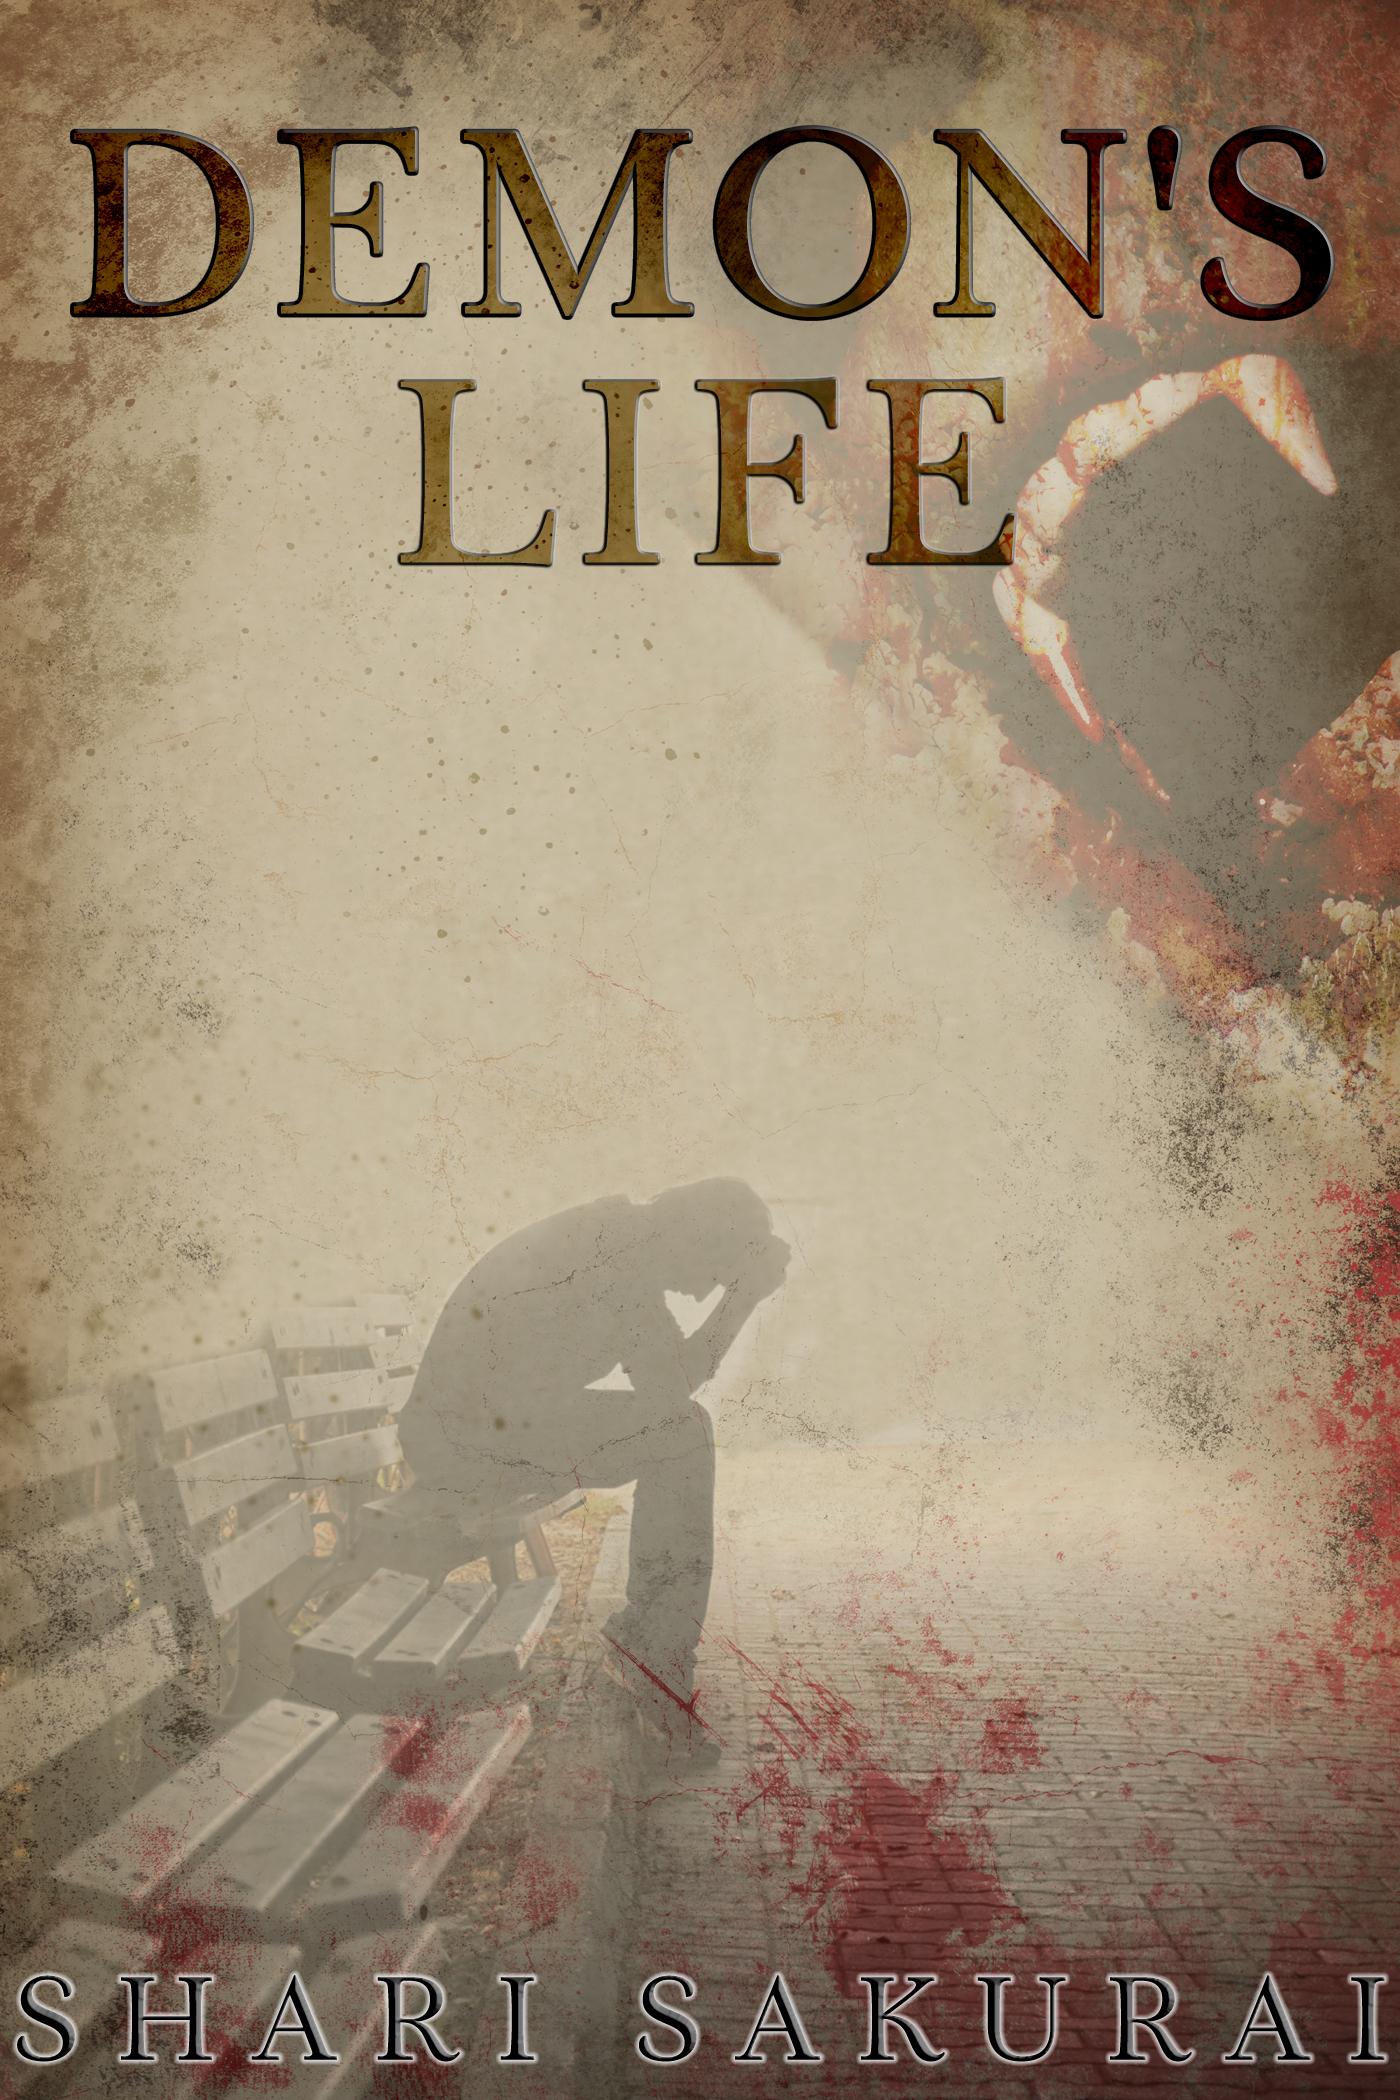 Demon's Life Cover copy